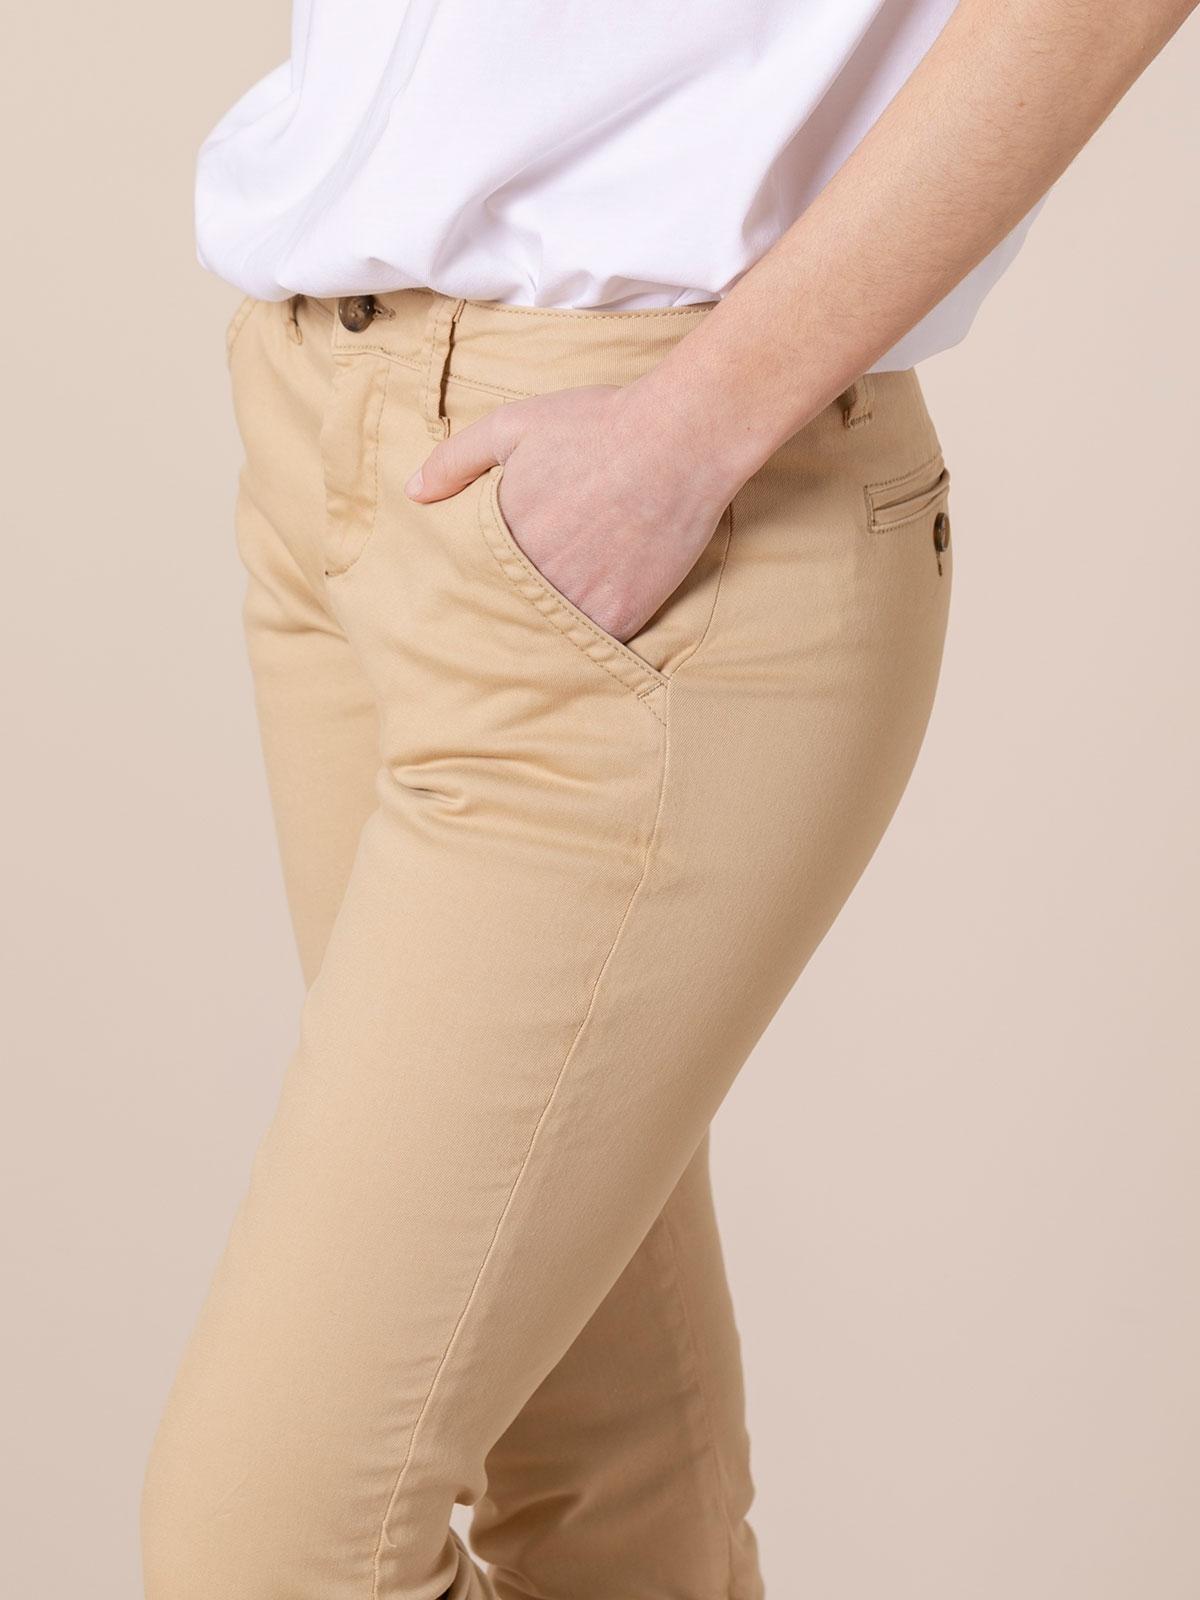 Pantalón chino mujer algodón elástico Camel